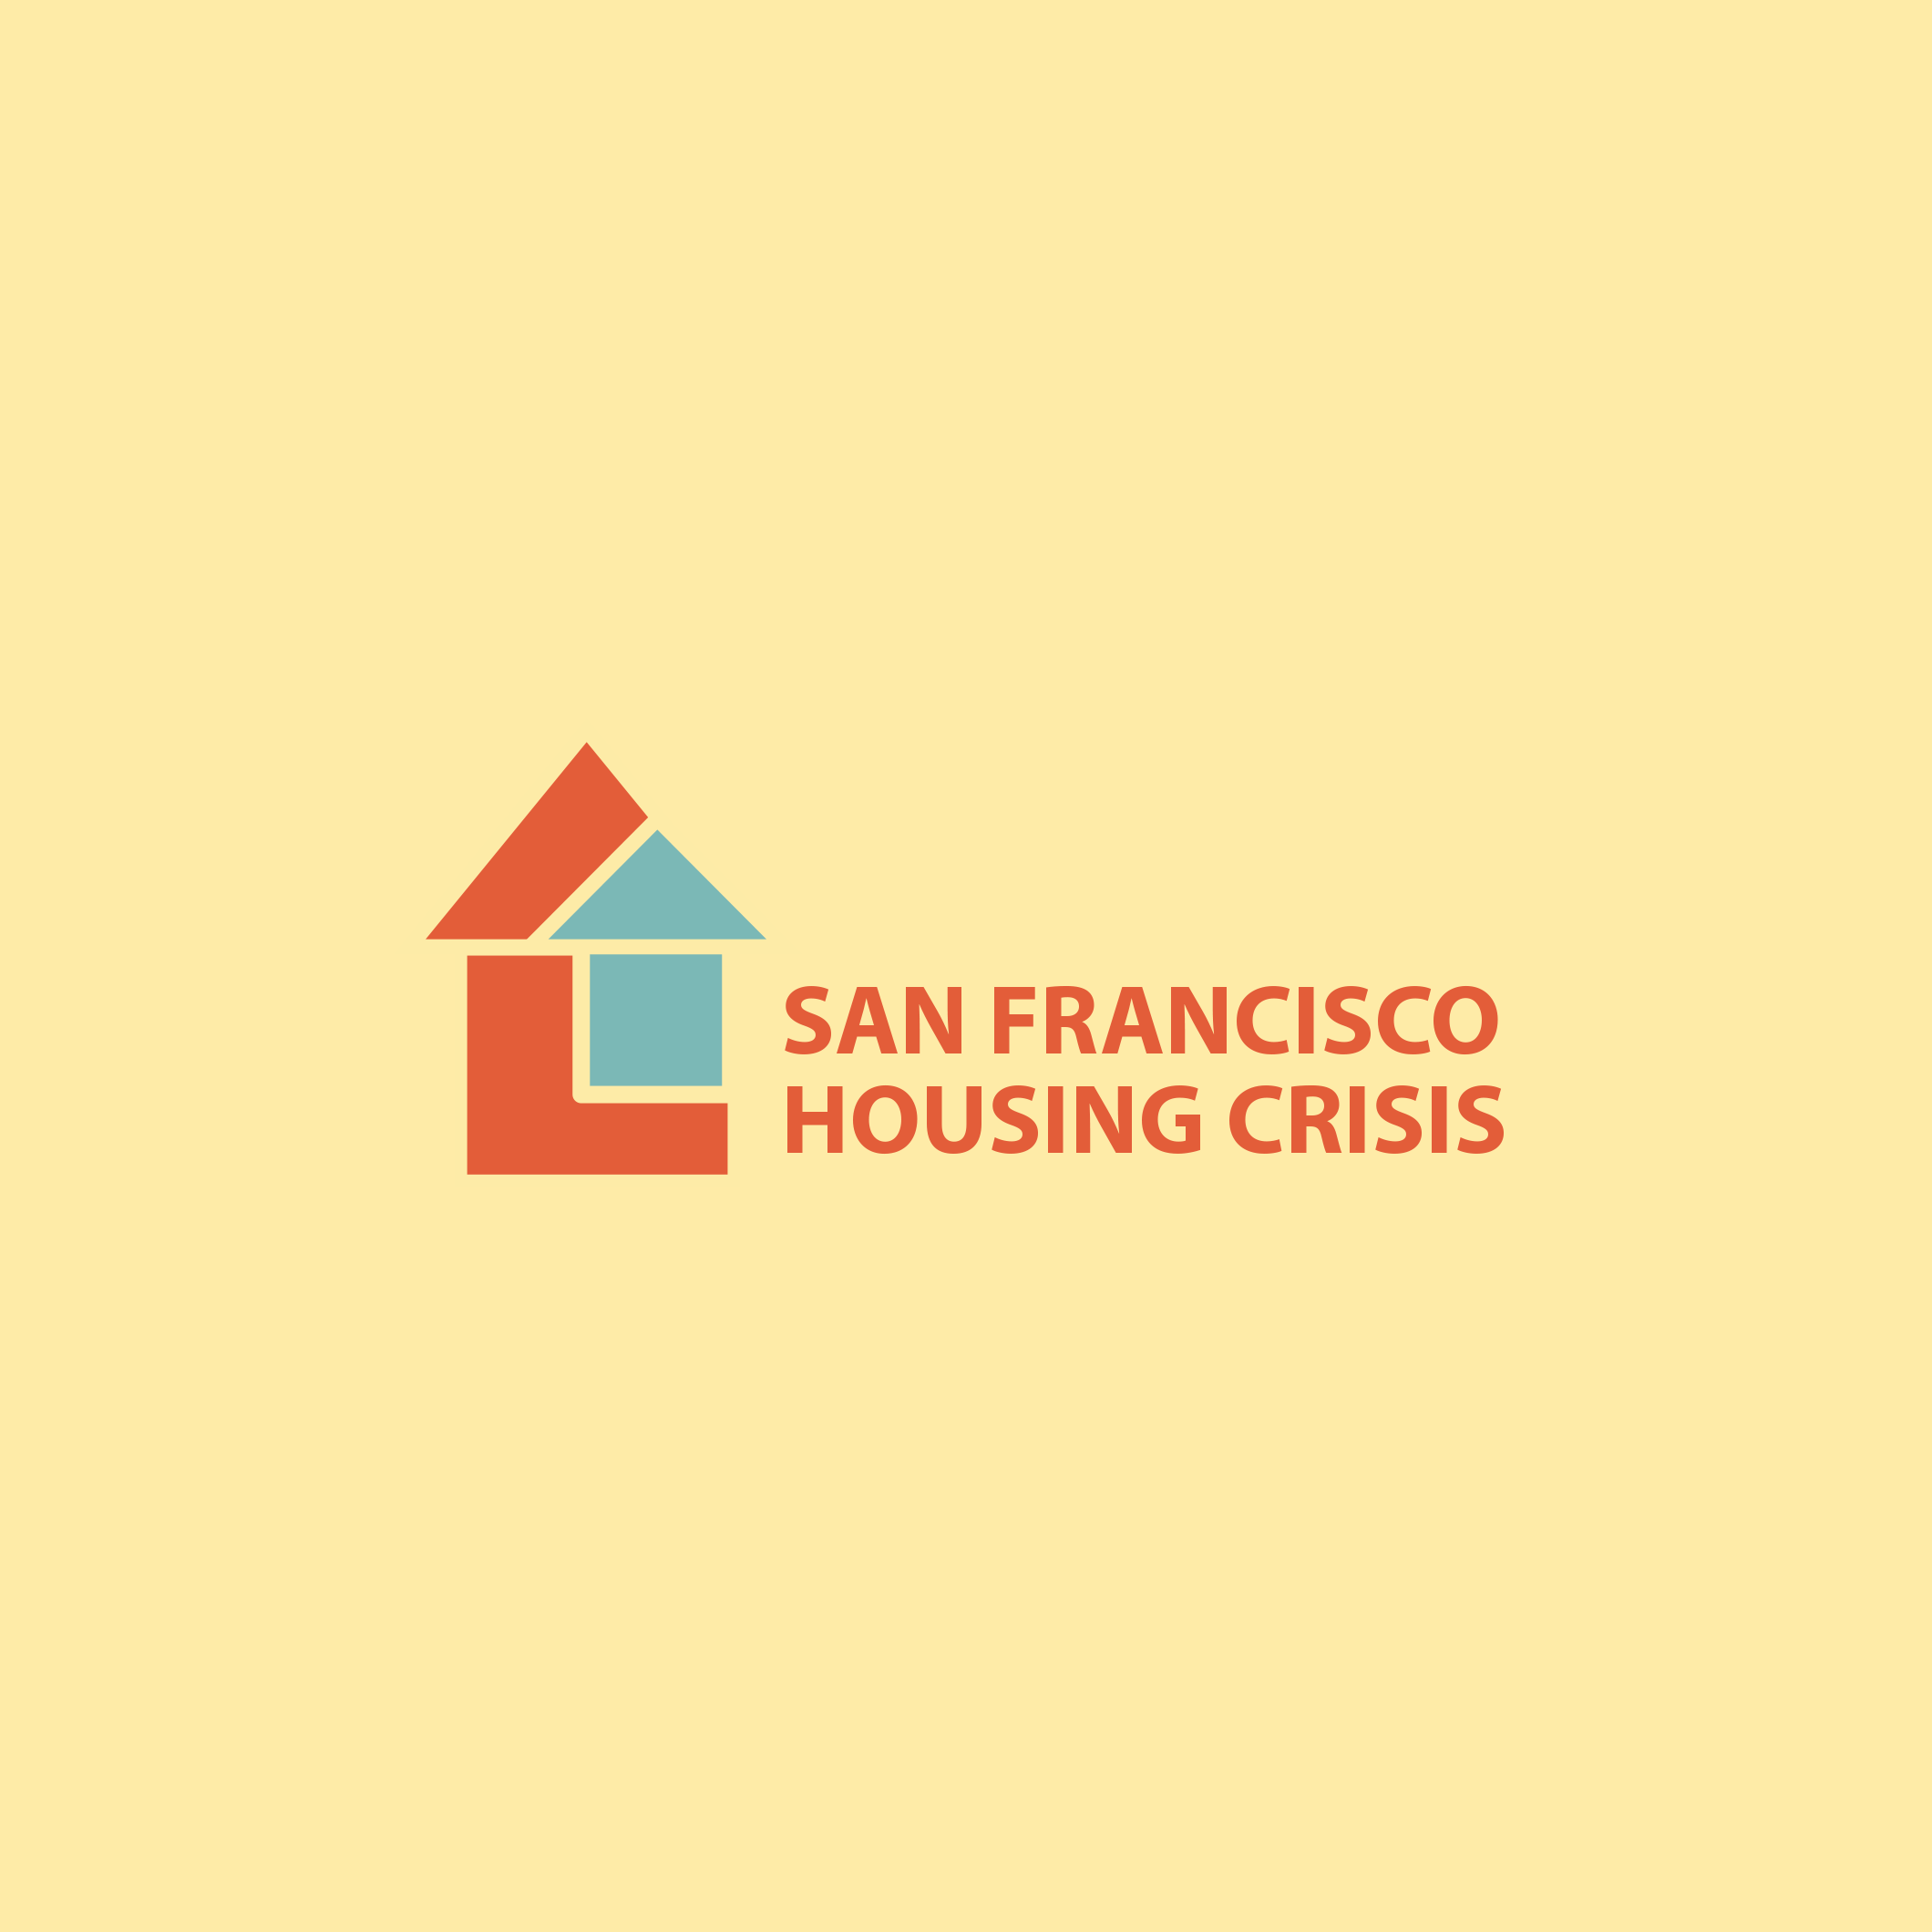 housing_crisis.png